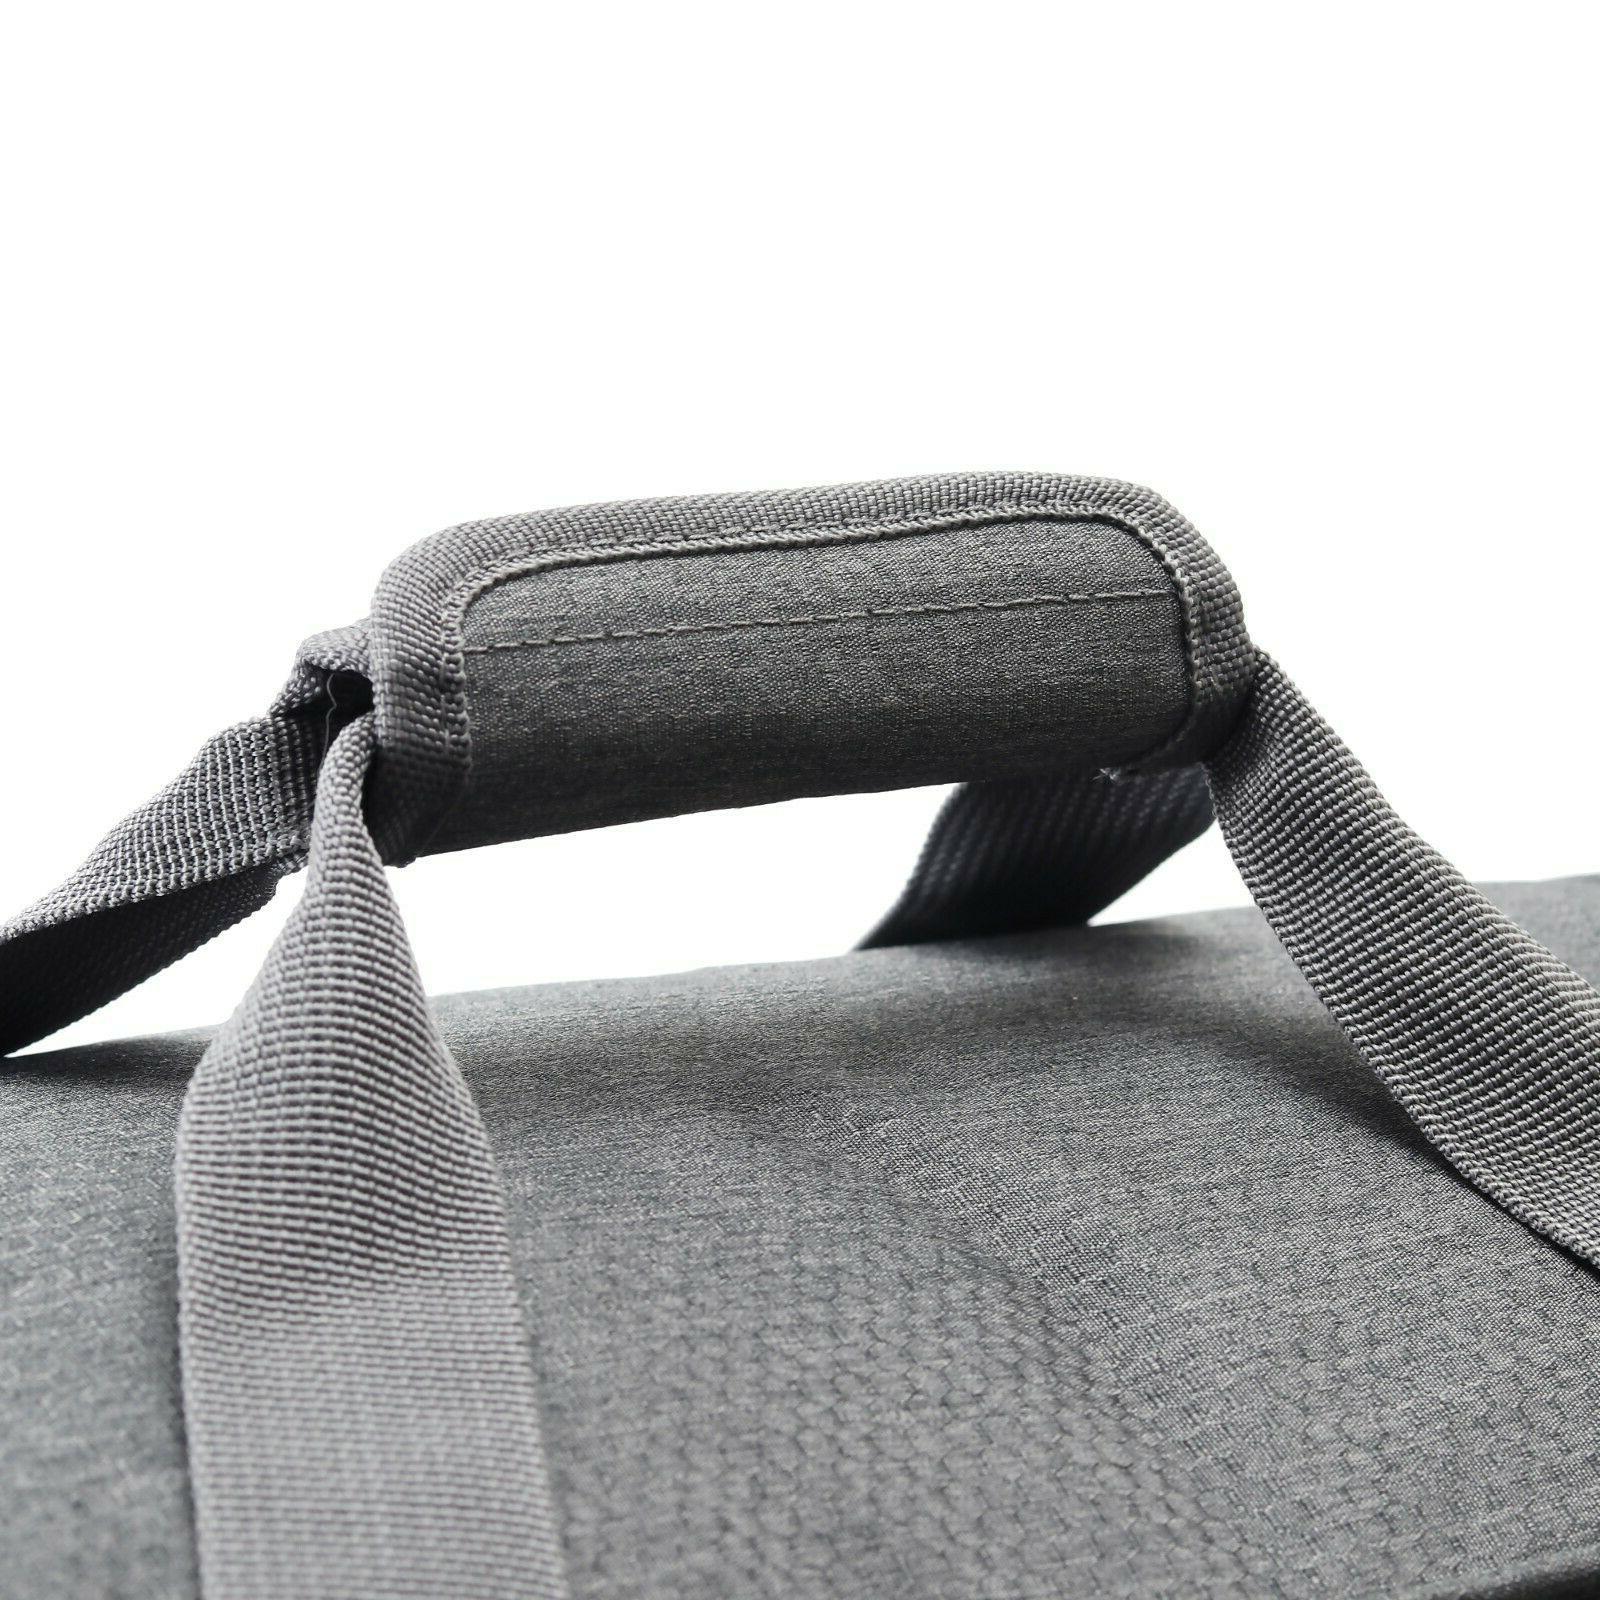 Duffel Bag Carry Travel